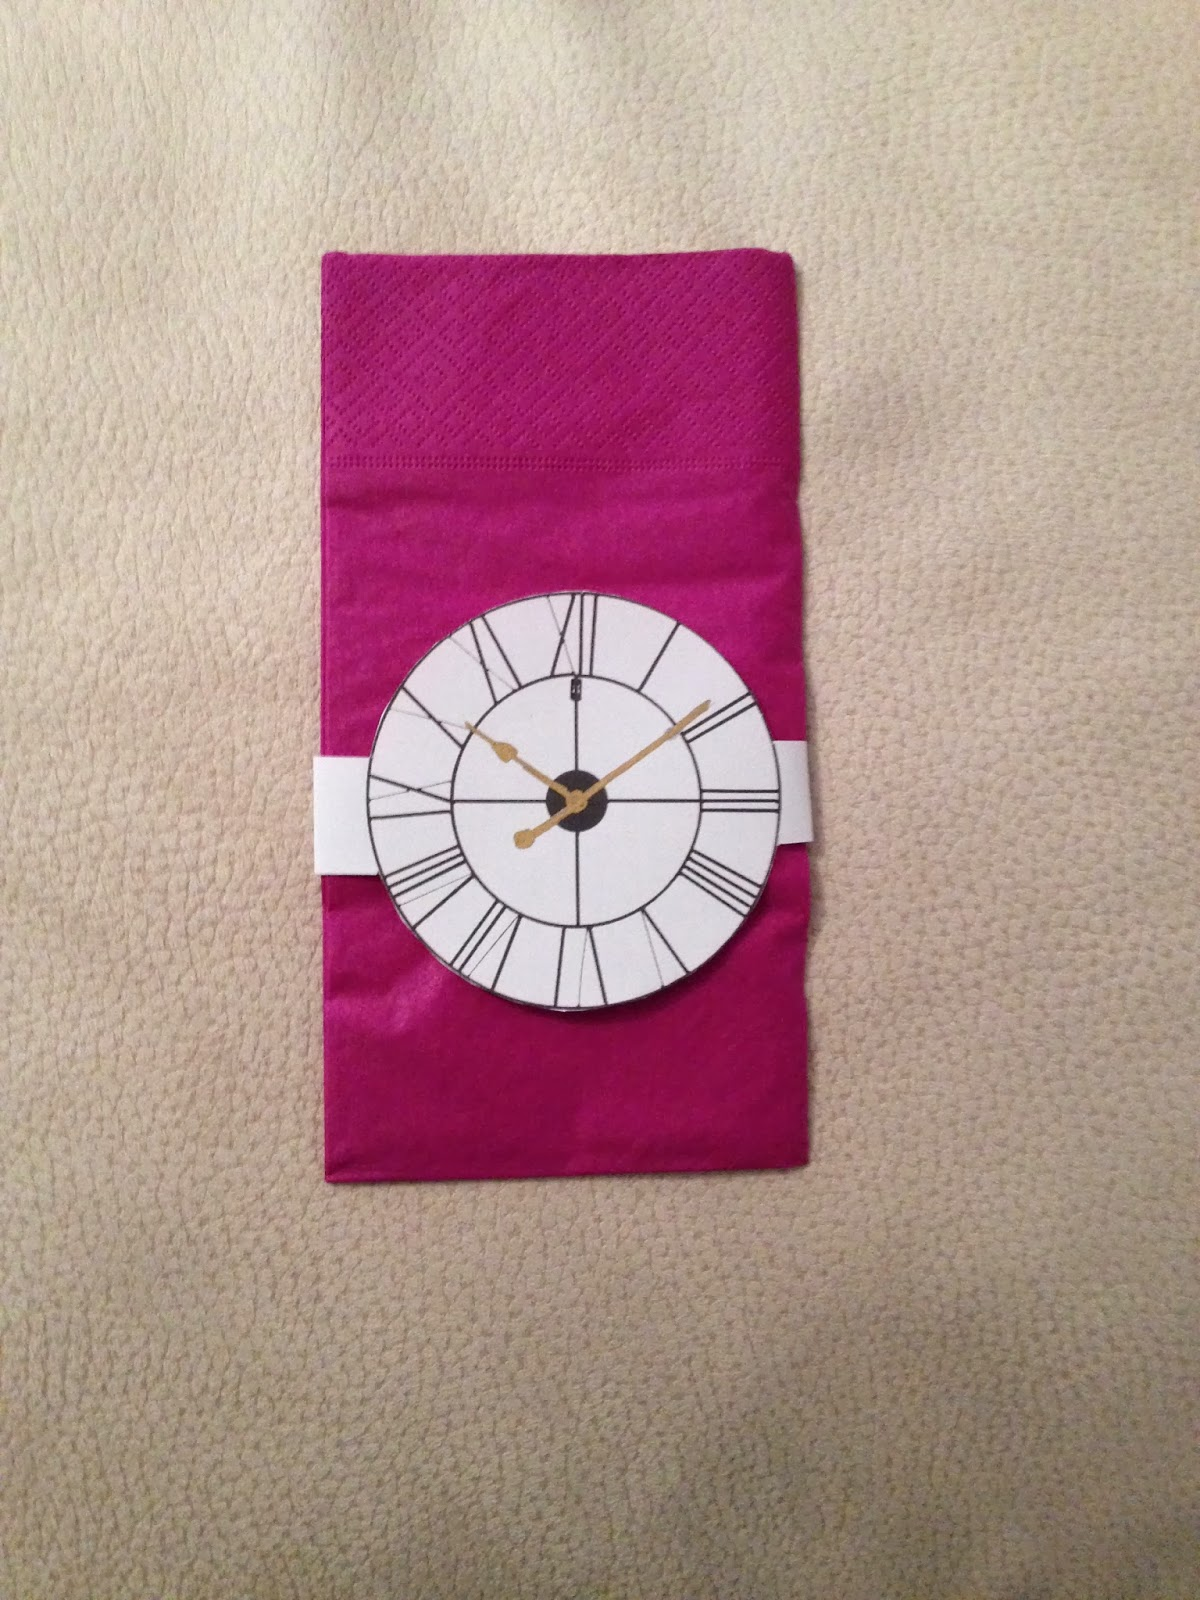 Ideas para una decoraci n de nochevieja fin de a o manualidades amelia - Manualidades relojes de pared ...